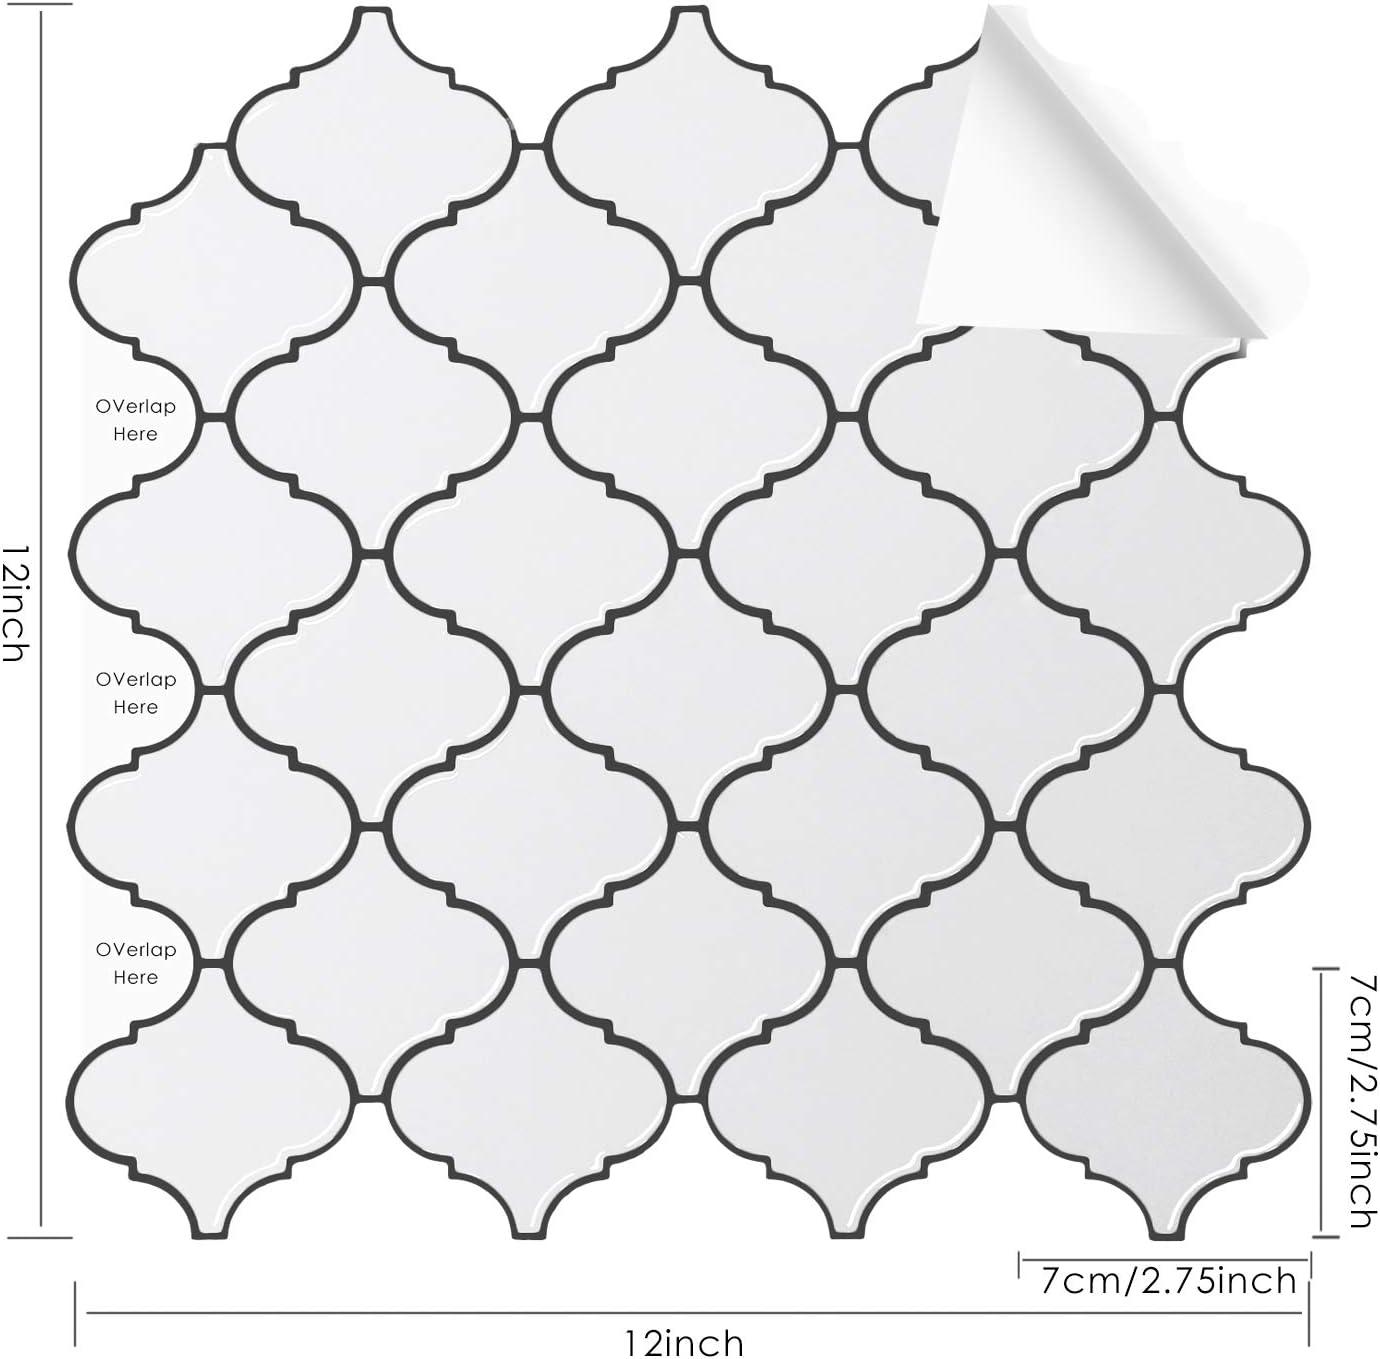 Peel and Stick Arabesque Tile Wall Sticker Living Room Bathroom Bedroom Self Adhesive Removable 3D Wall Sticker for Kitchen Decorative Tile Backsplash 5-Sheet, 12 x12